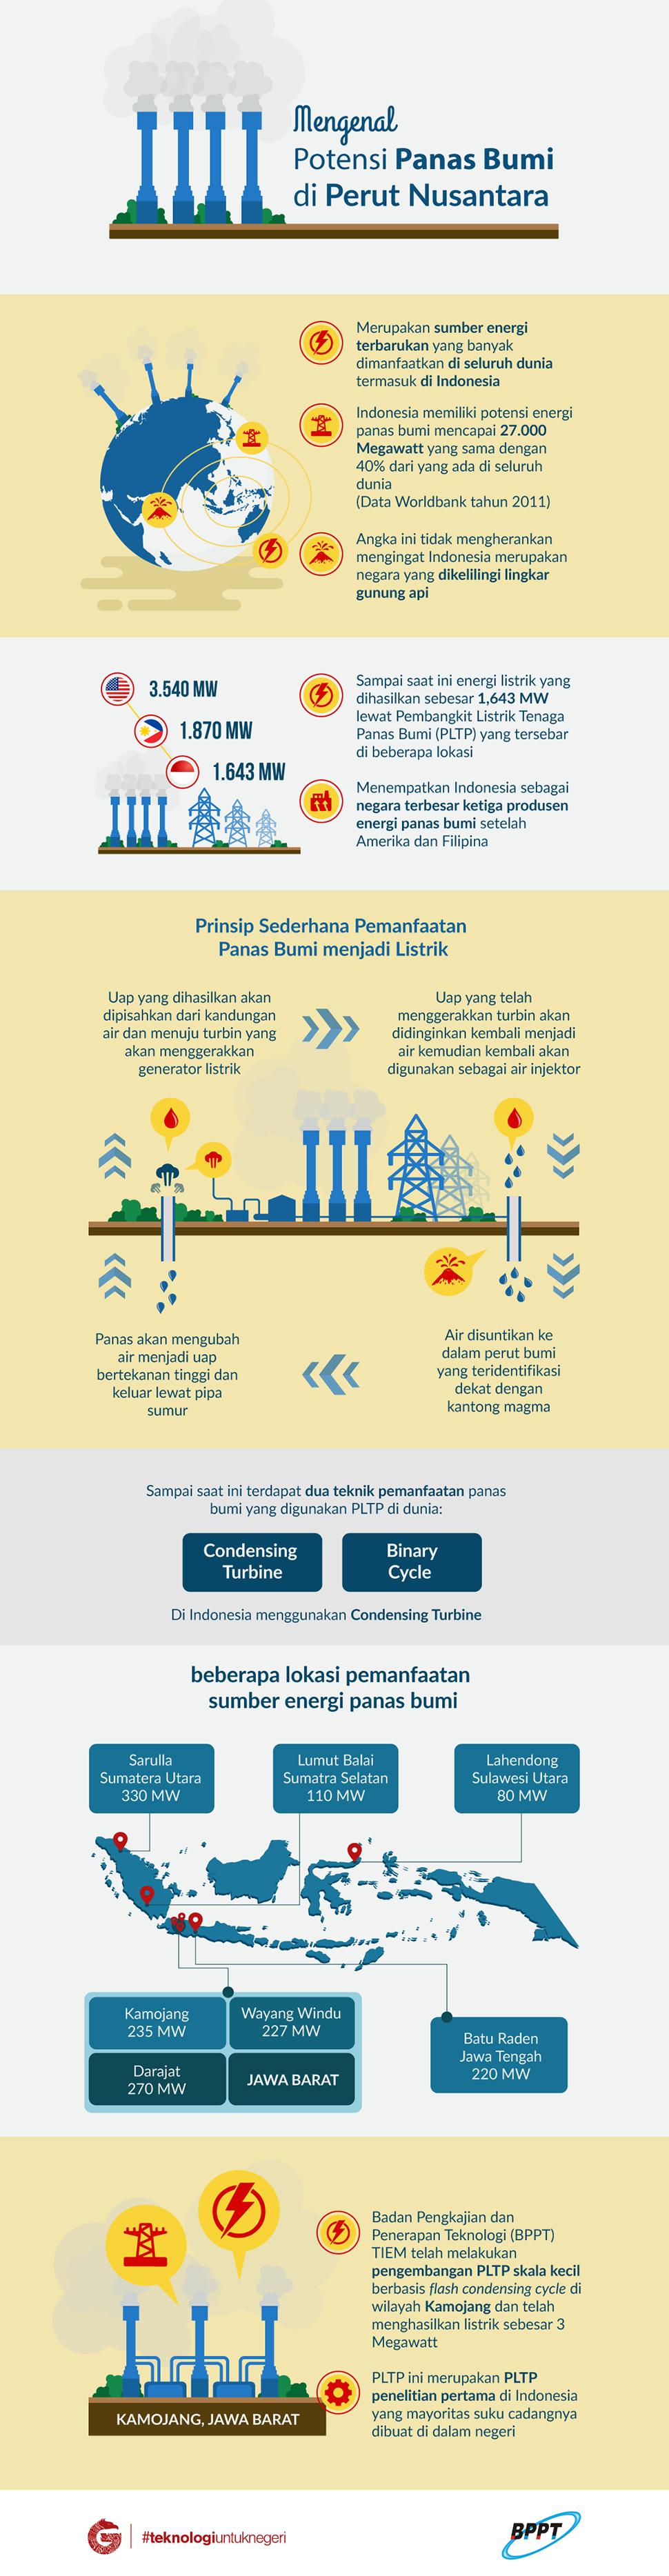 Mengenal Potensi Panas Bumi di Perut Nusantara